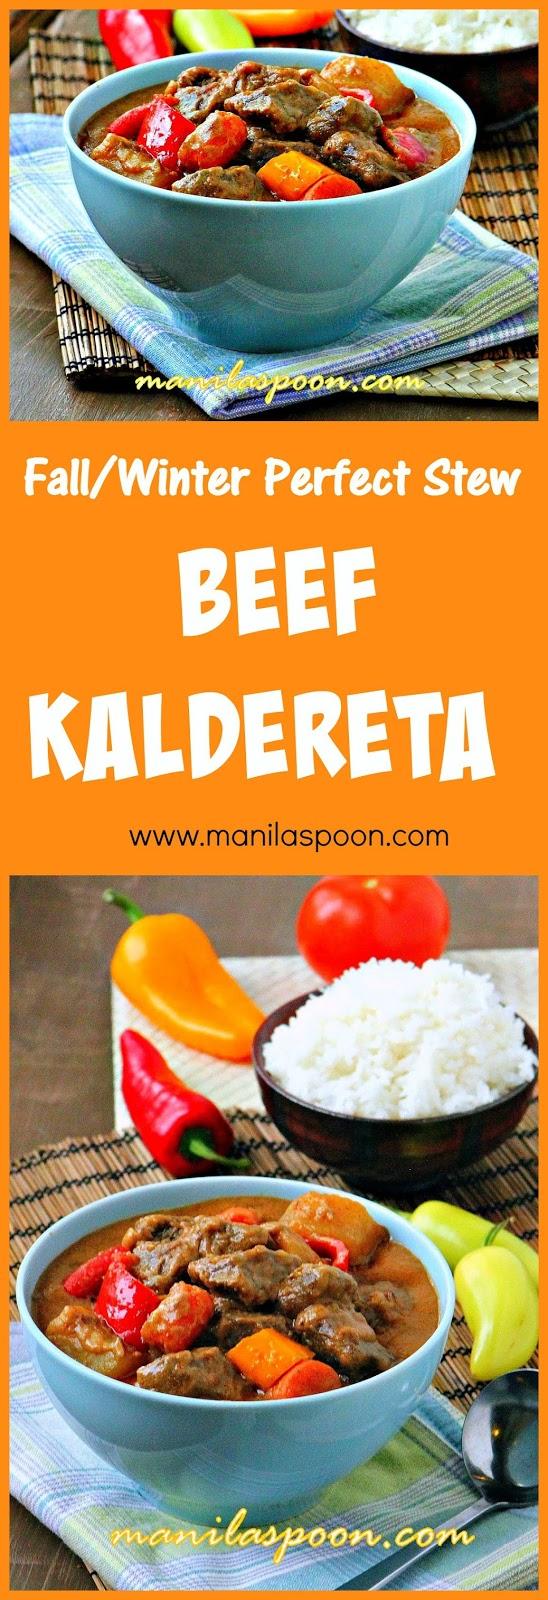 Creamy, nutty, spicy and delicious! This tasty beef stew is comfort food at its best - BEEF KALDERETA #caldereta #kaldereta